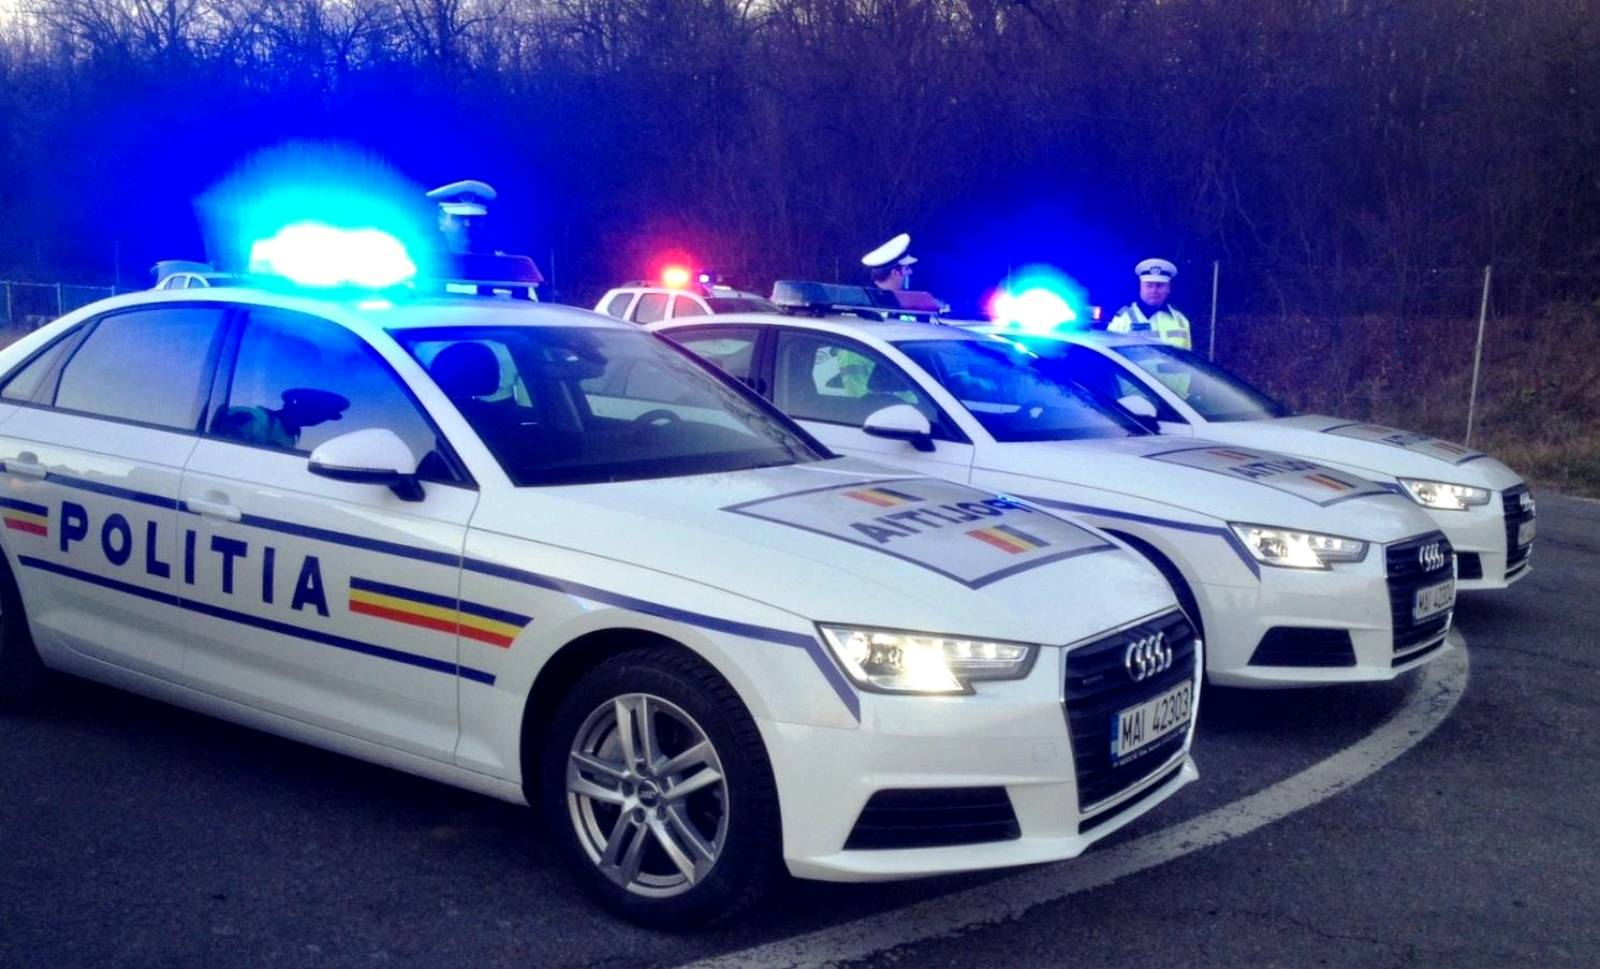 Politia Romana barbat arestat amenintari Facebook